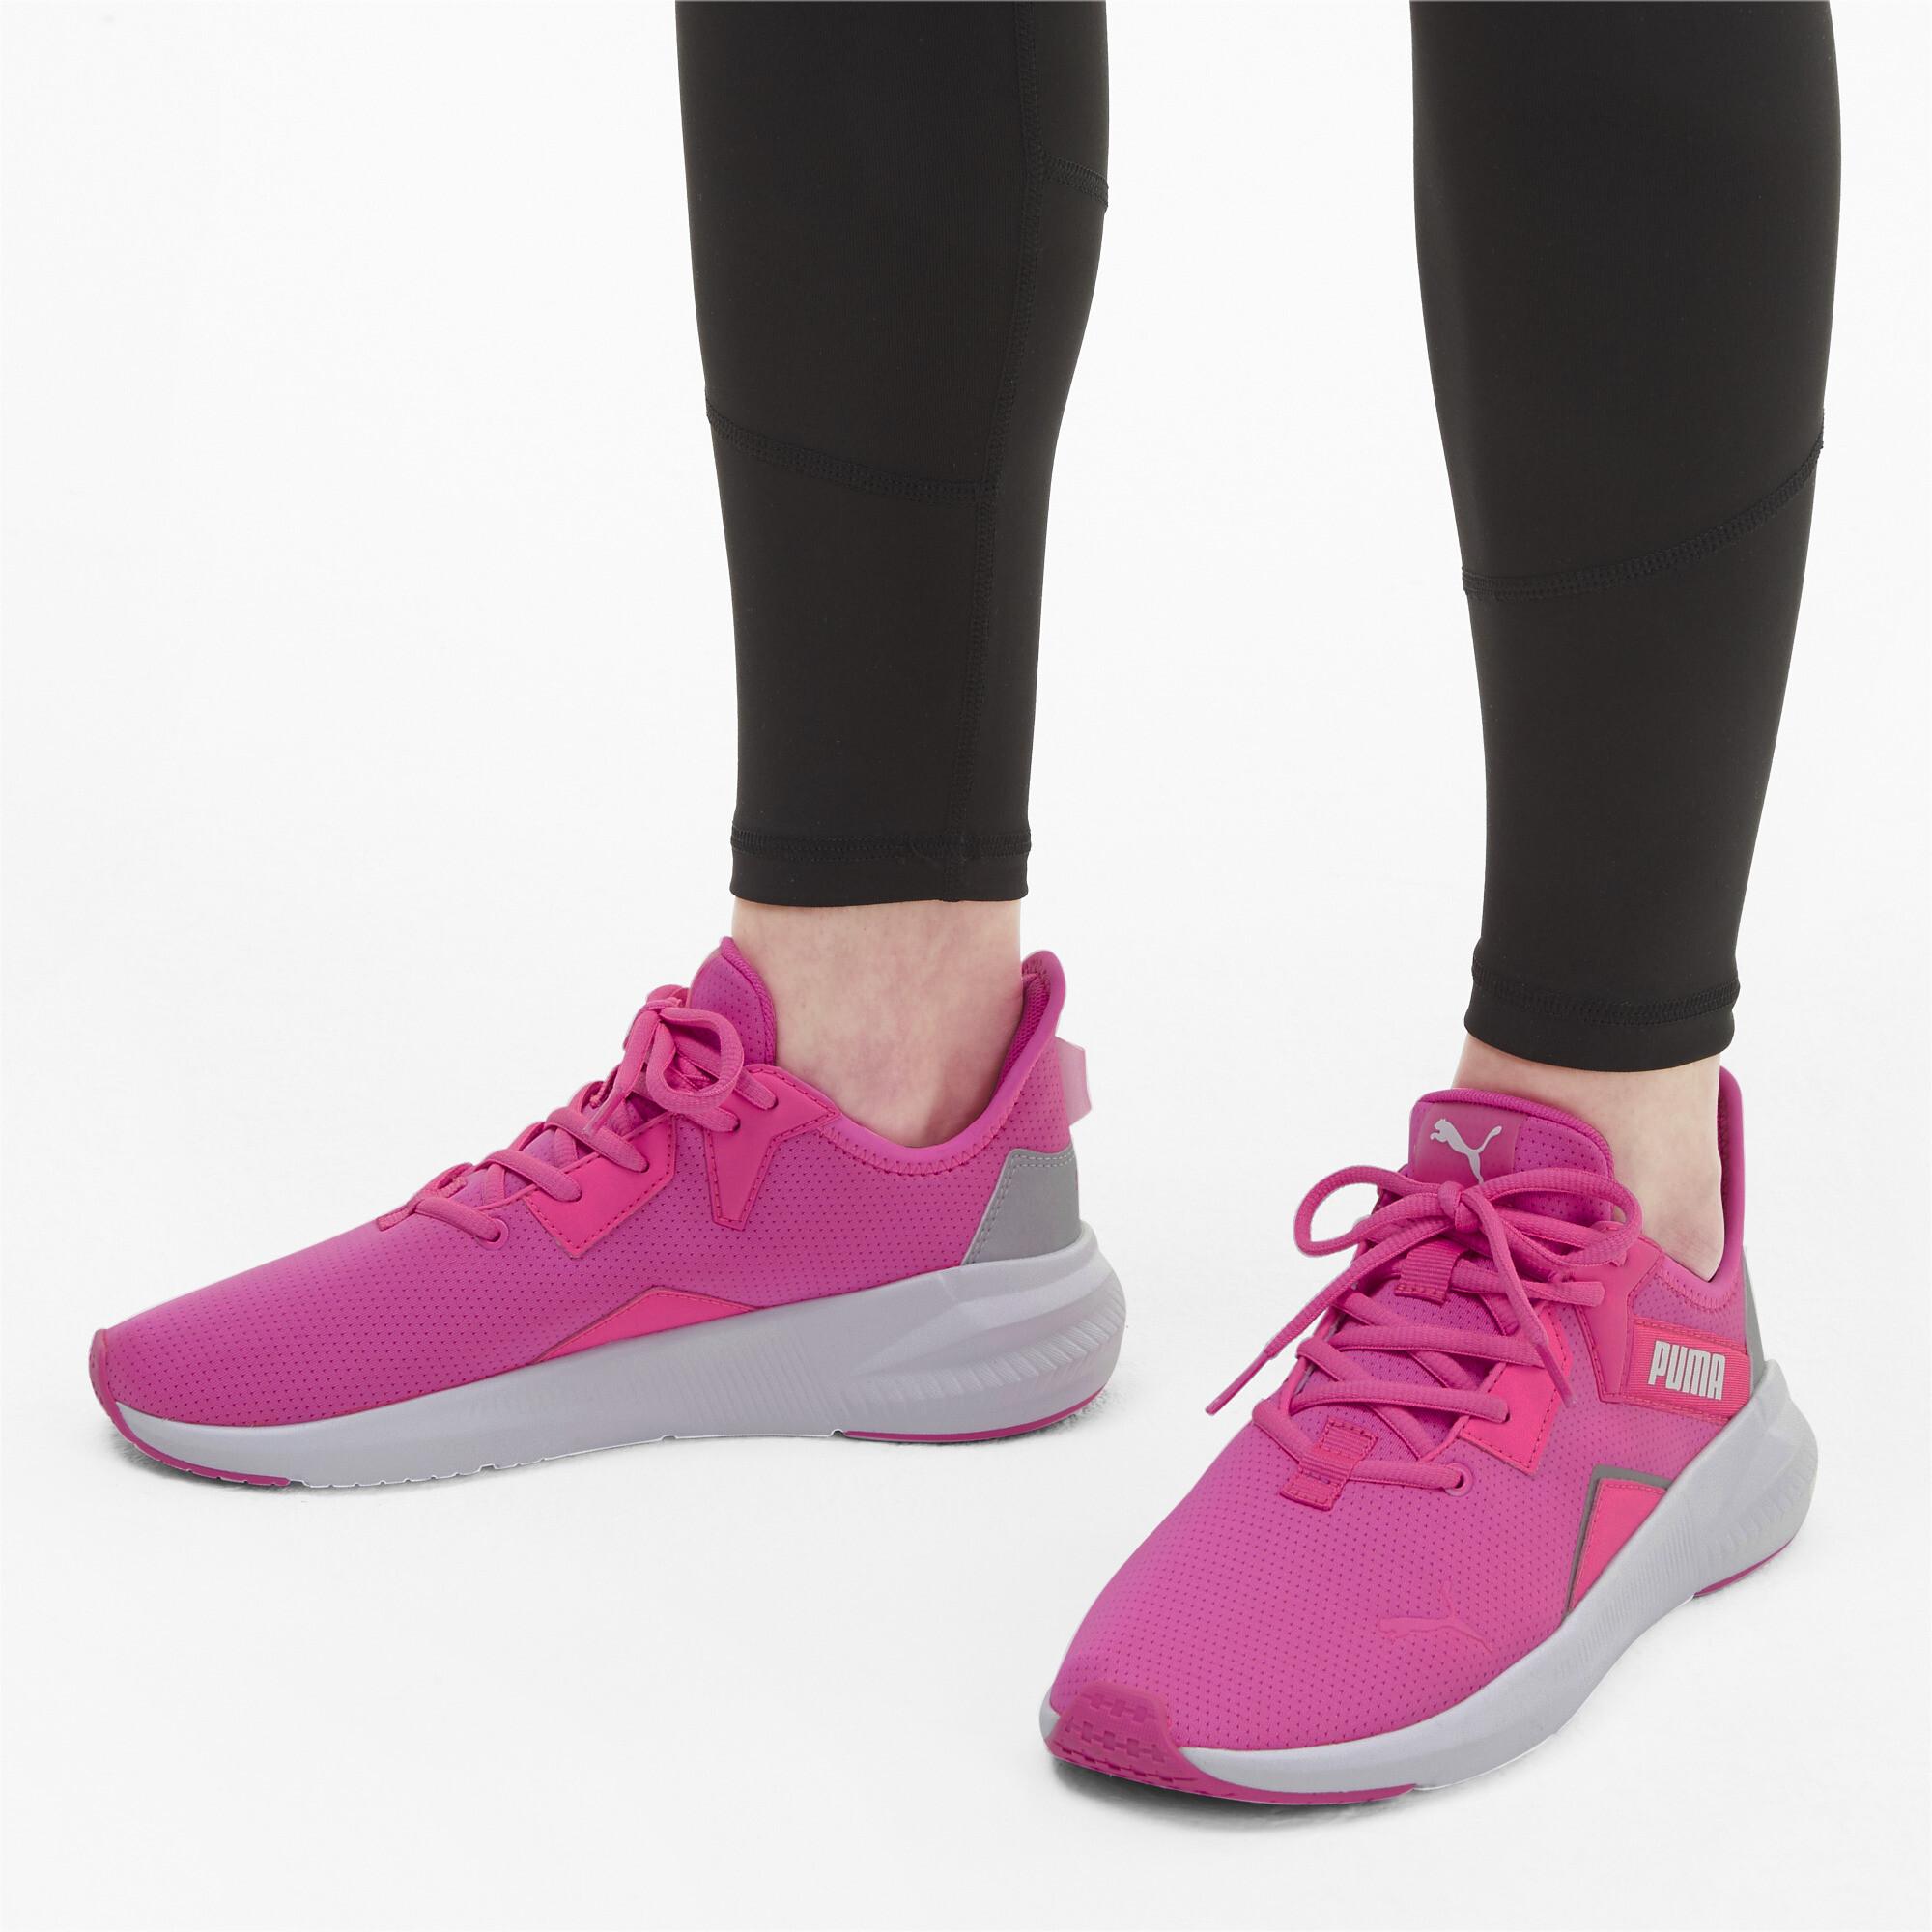 thumbnail 12 - PUMA-Women-039-s-Platinum-Training-Shoes